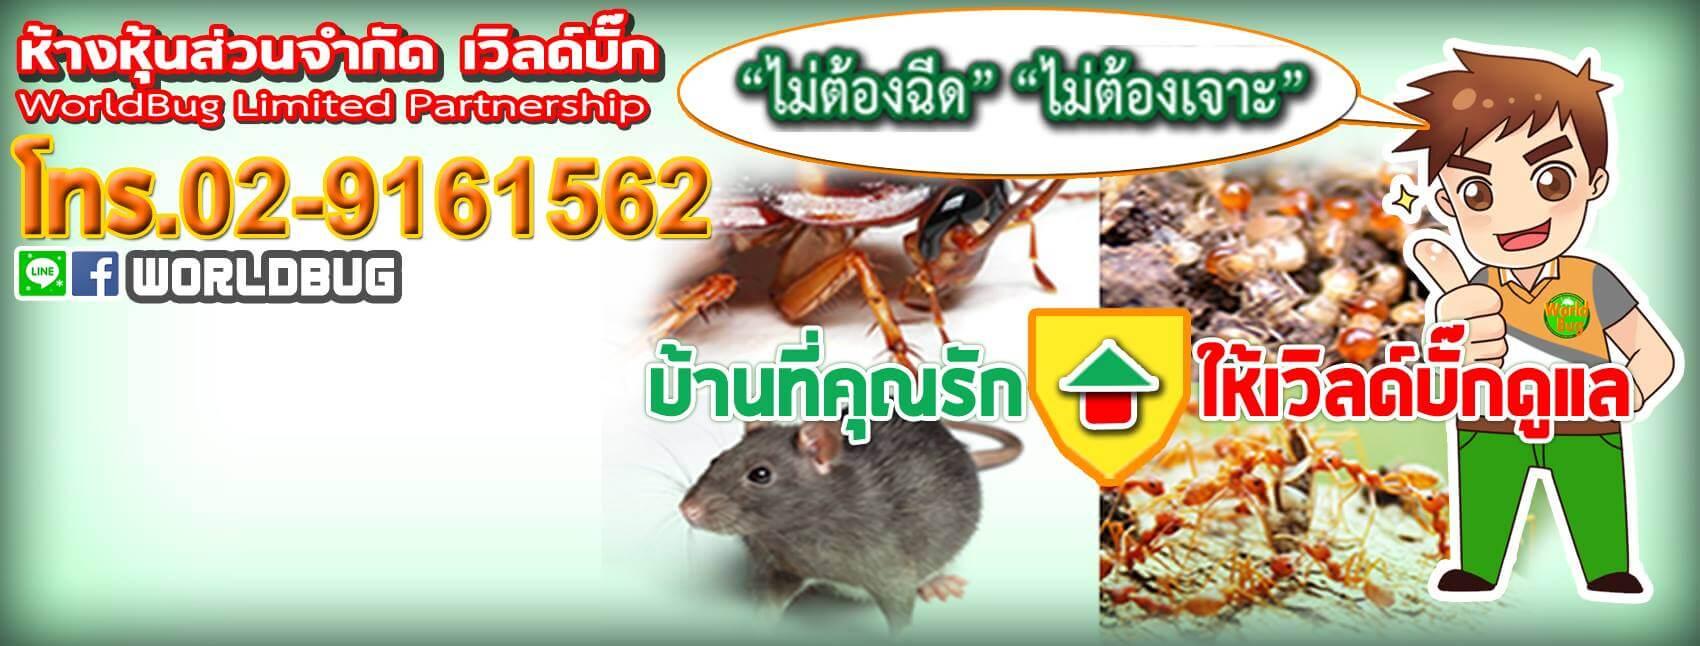 Worldbug กำจัดปลวก - กำจัดปลวกมืออาชีพมั่นคงปลอดภัย